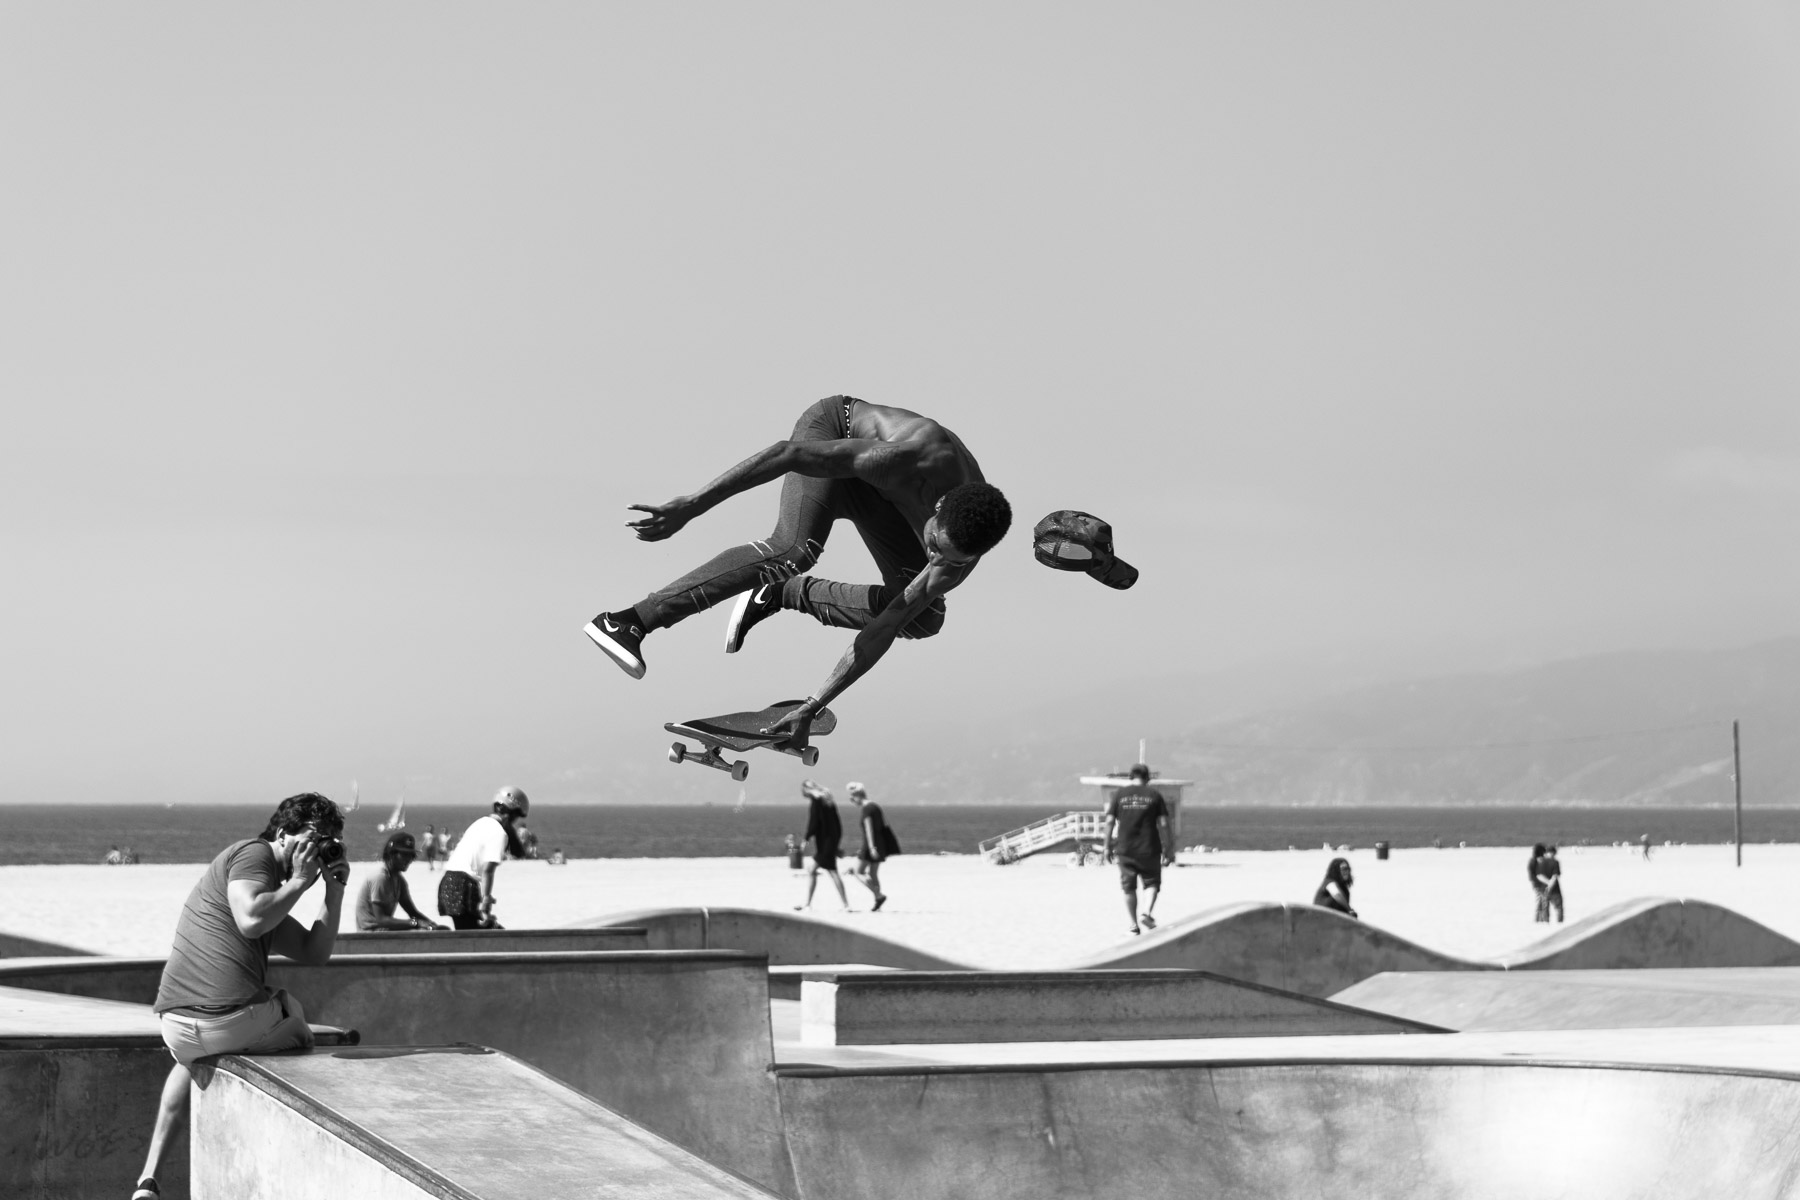 Christian Meixner Fotografie, Fotograf Zürich, Los Angeles, Skater, Venice Beach, USA, Reisen, Reisefotografie